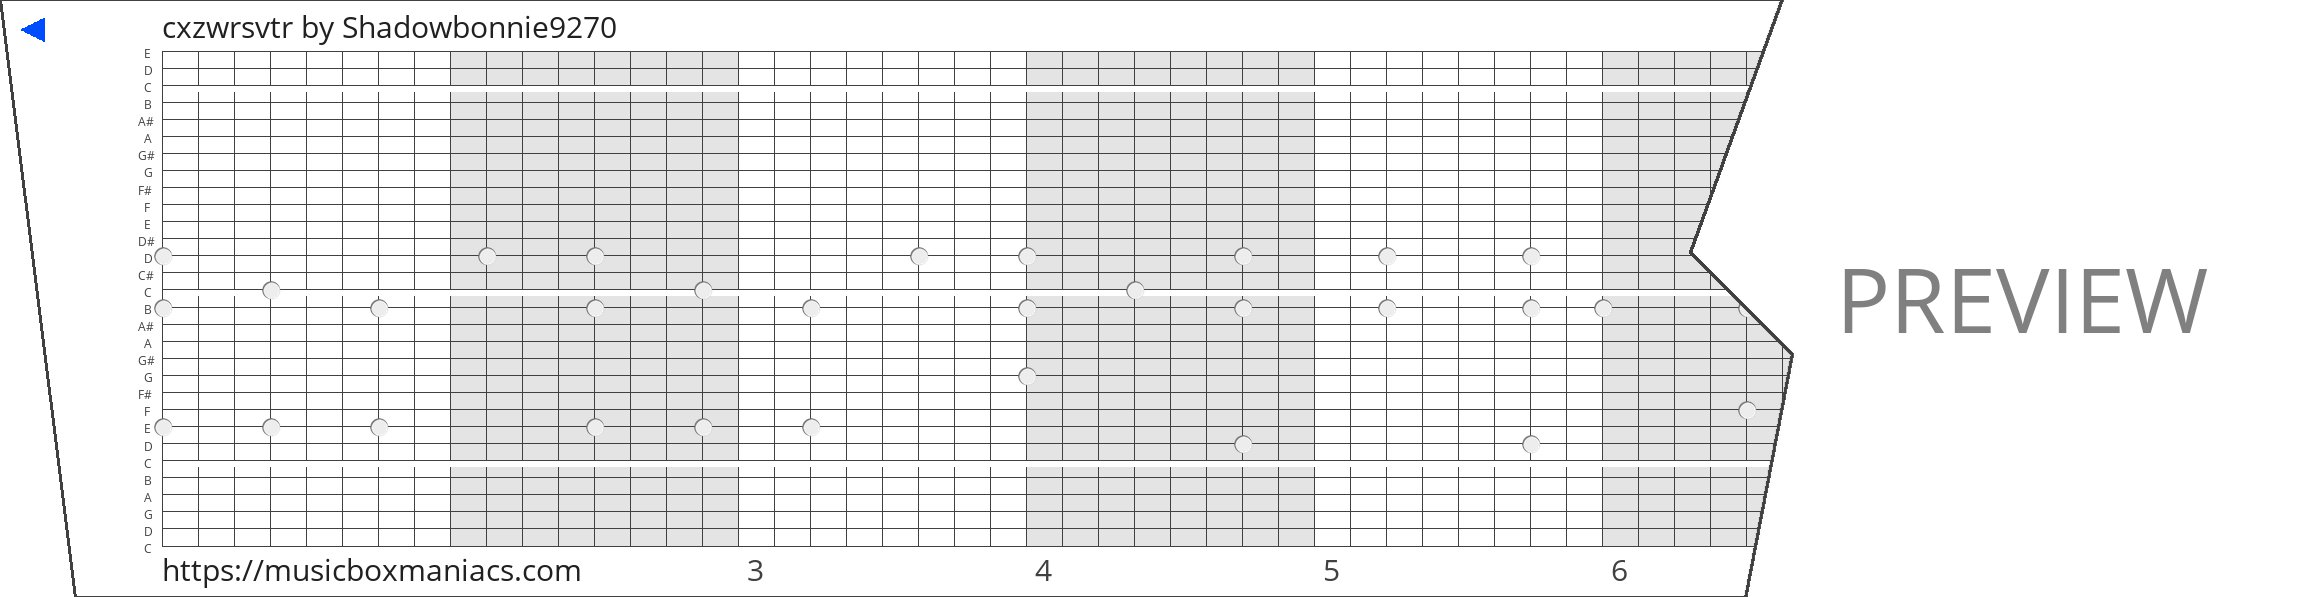 cxzwrsvtr 30 note music box paper strip